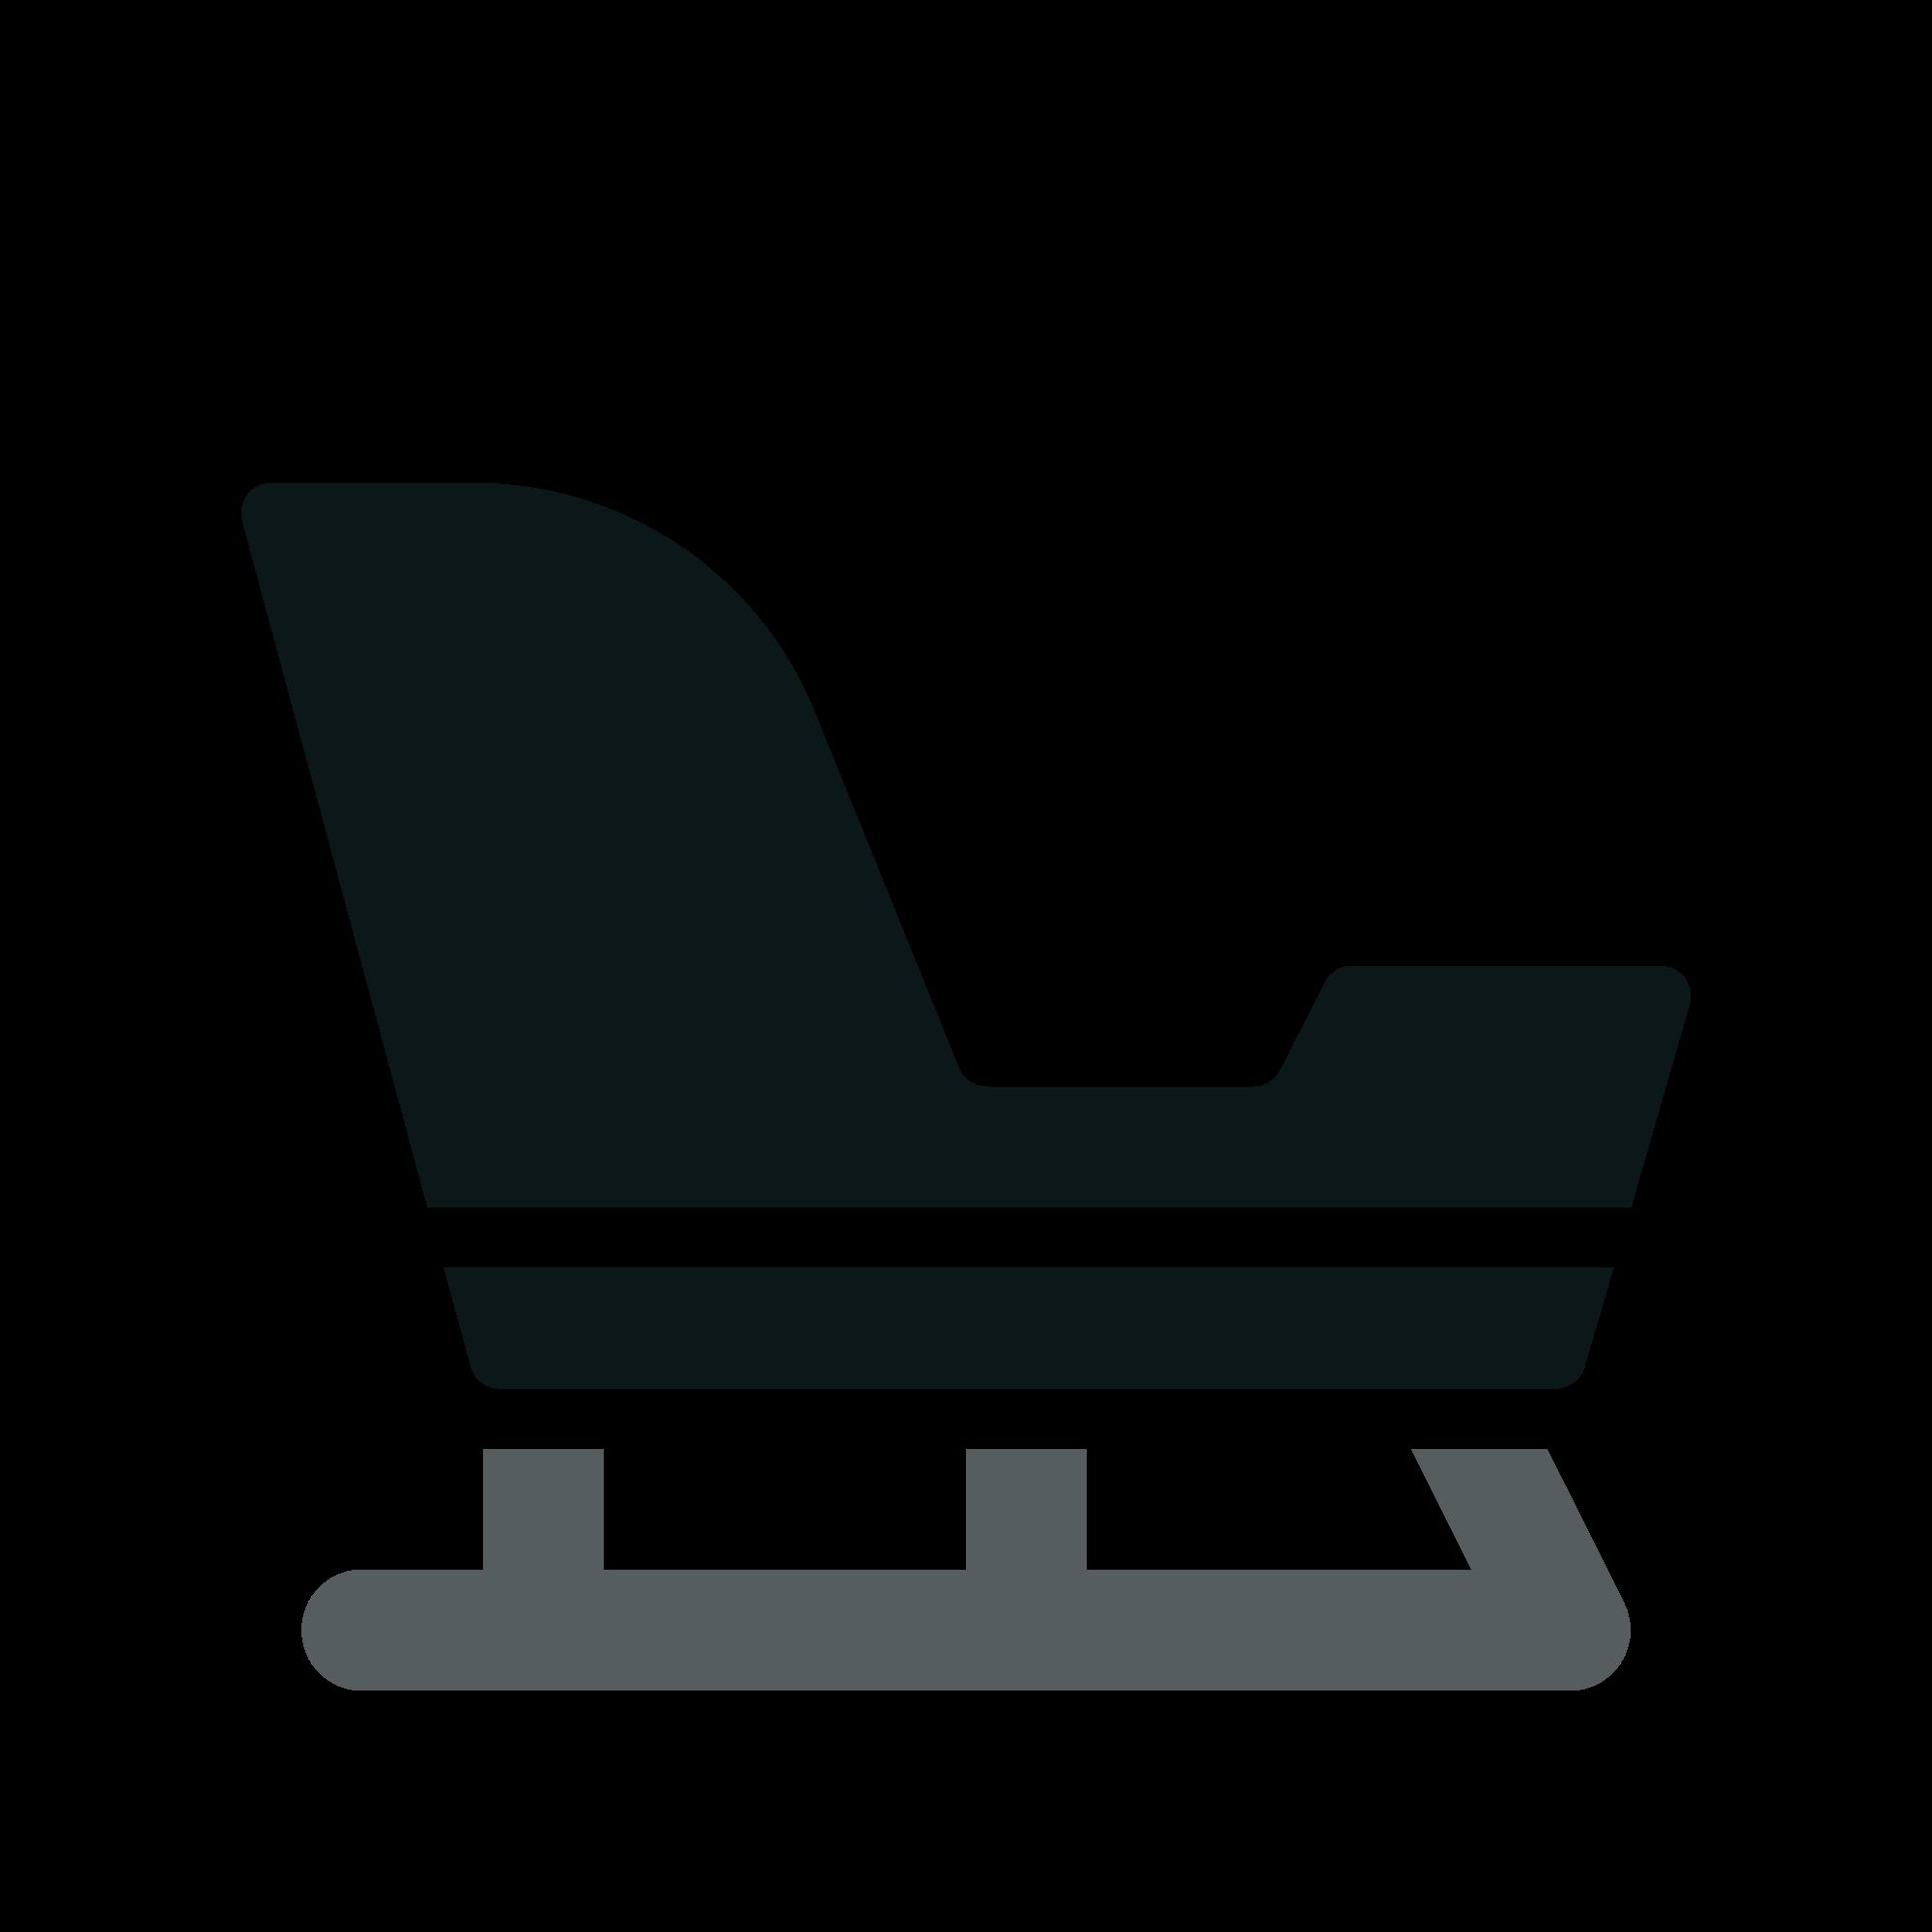 Sleigh clipart svg. File toicon icon duotone